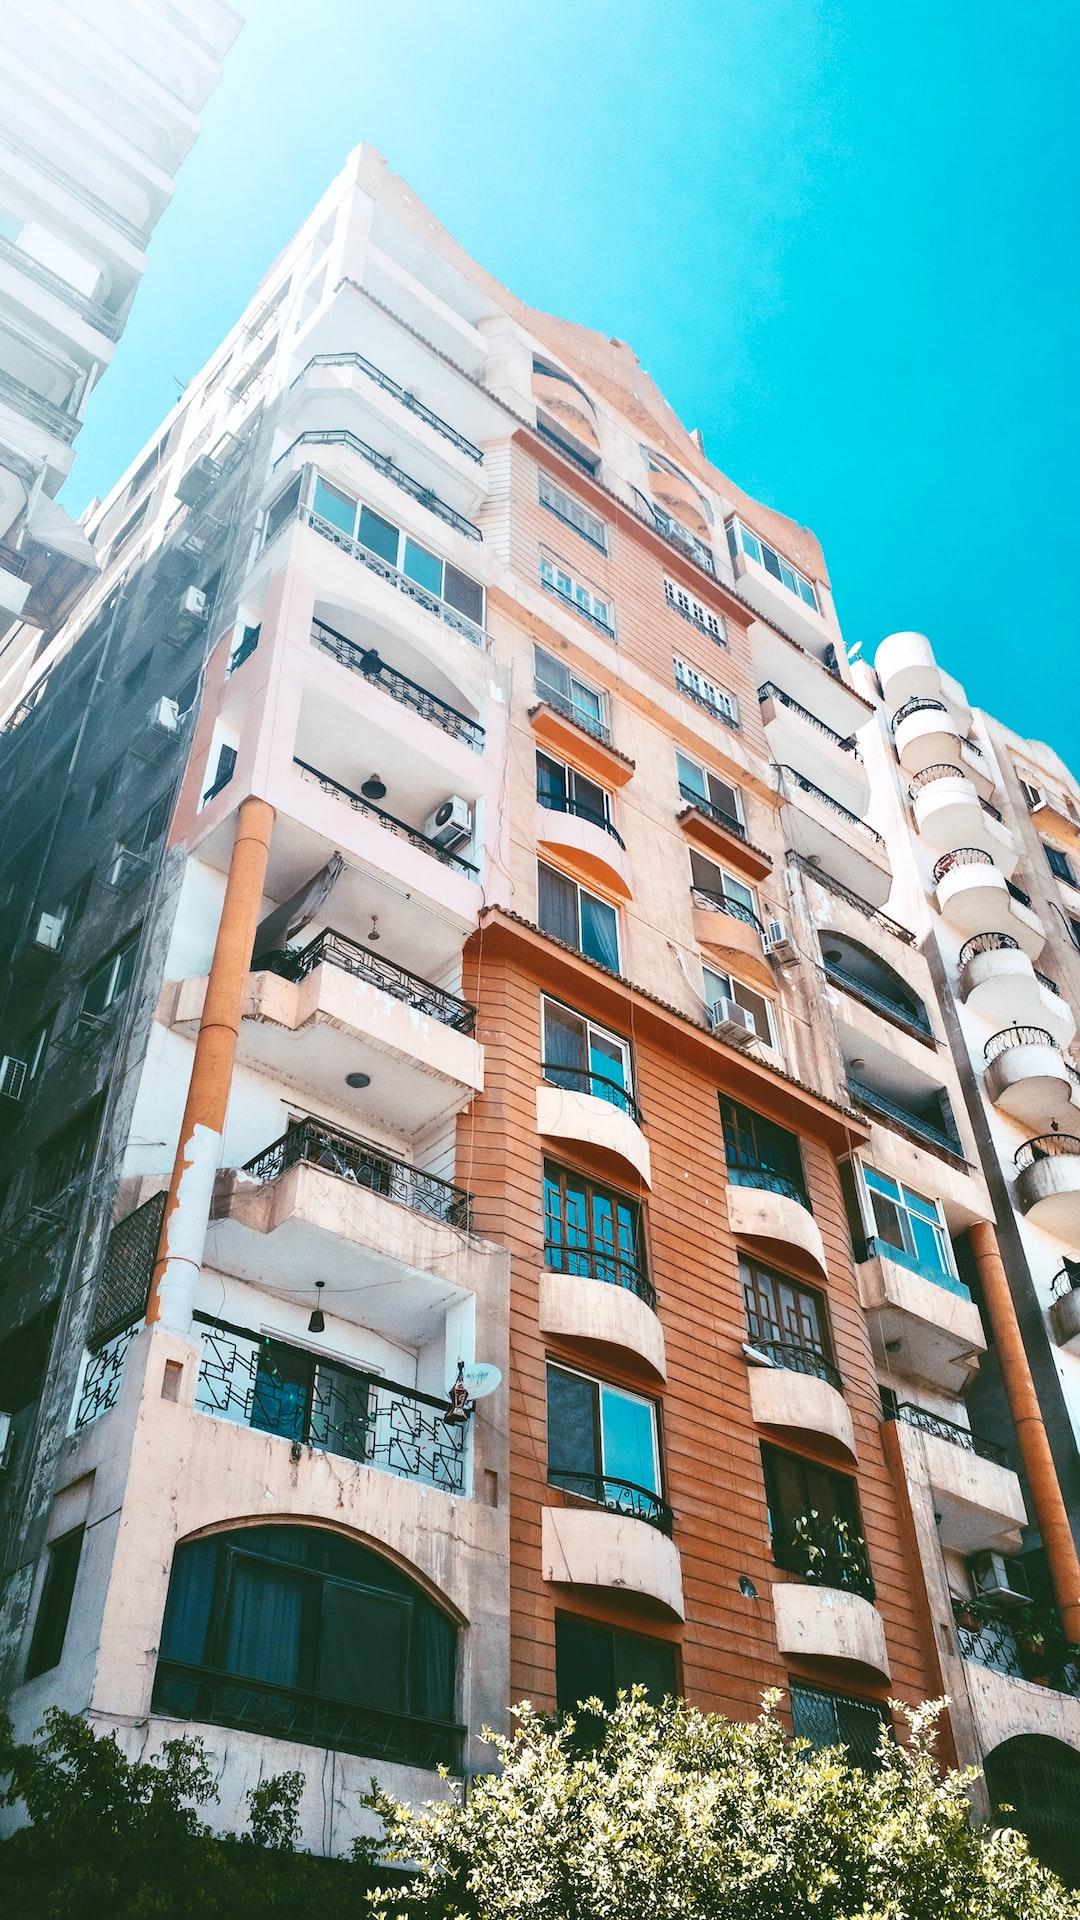 CAIRO BUILDING IN AL-MAADI حي المعادي